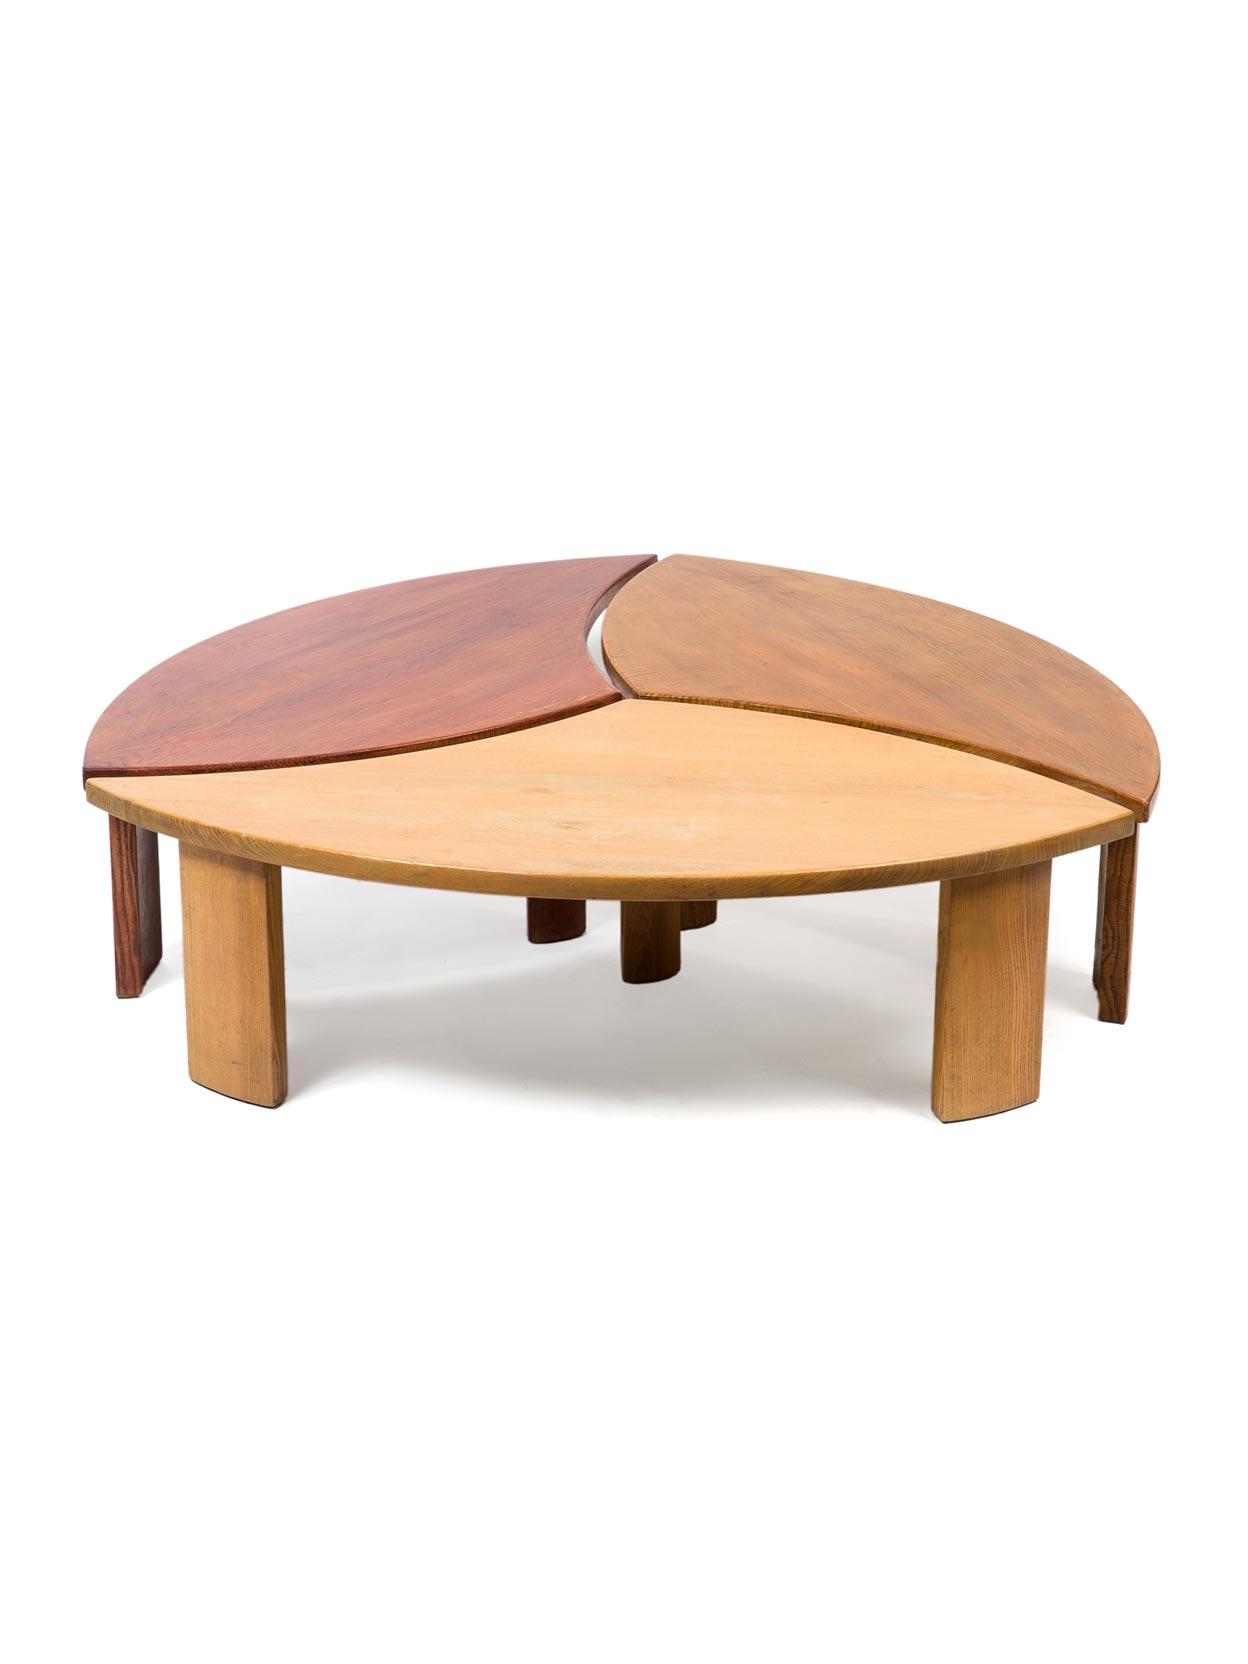 Chapo Table VINTAGE0097